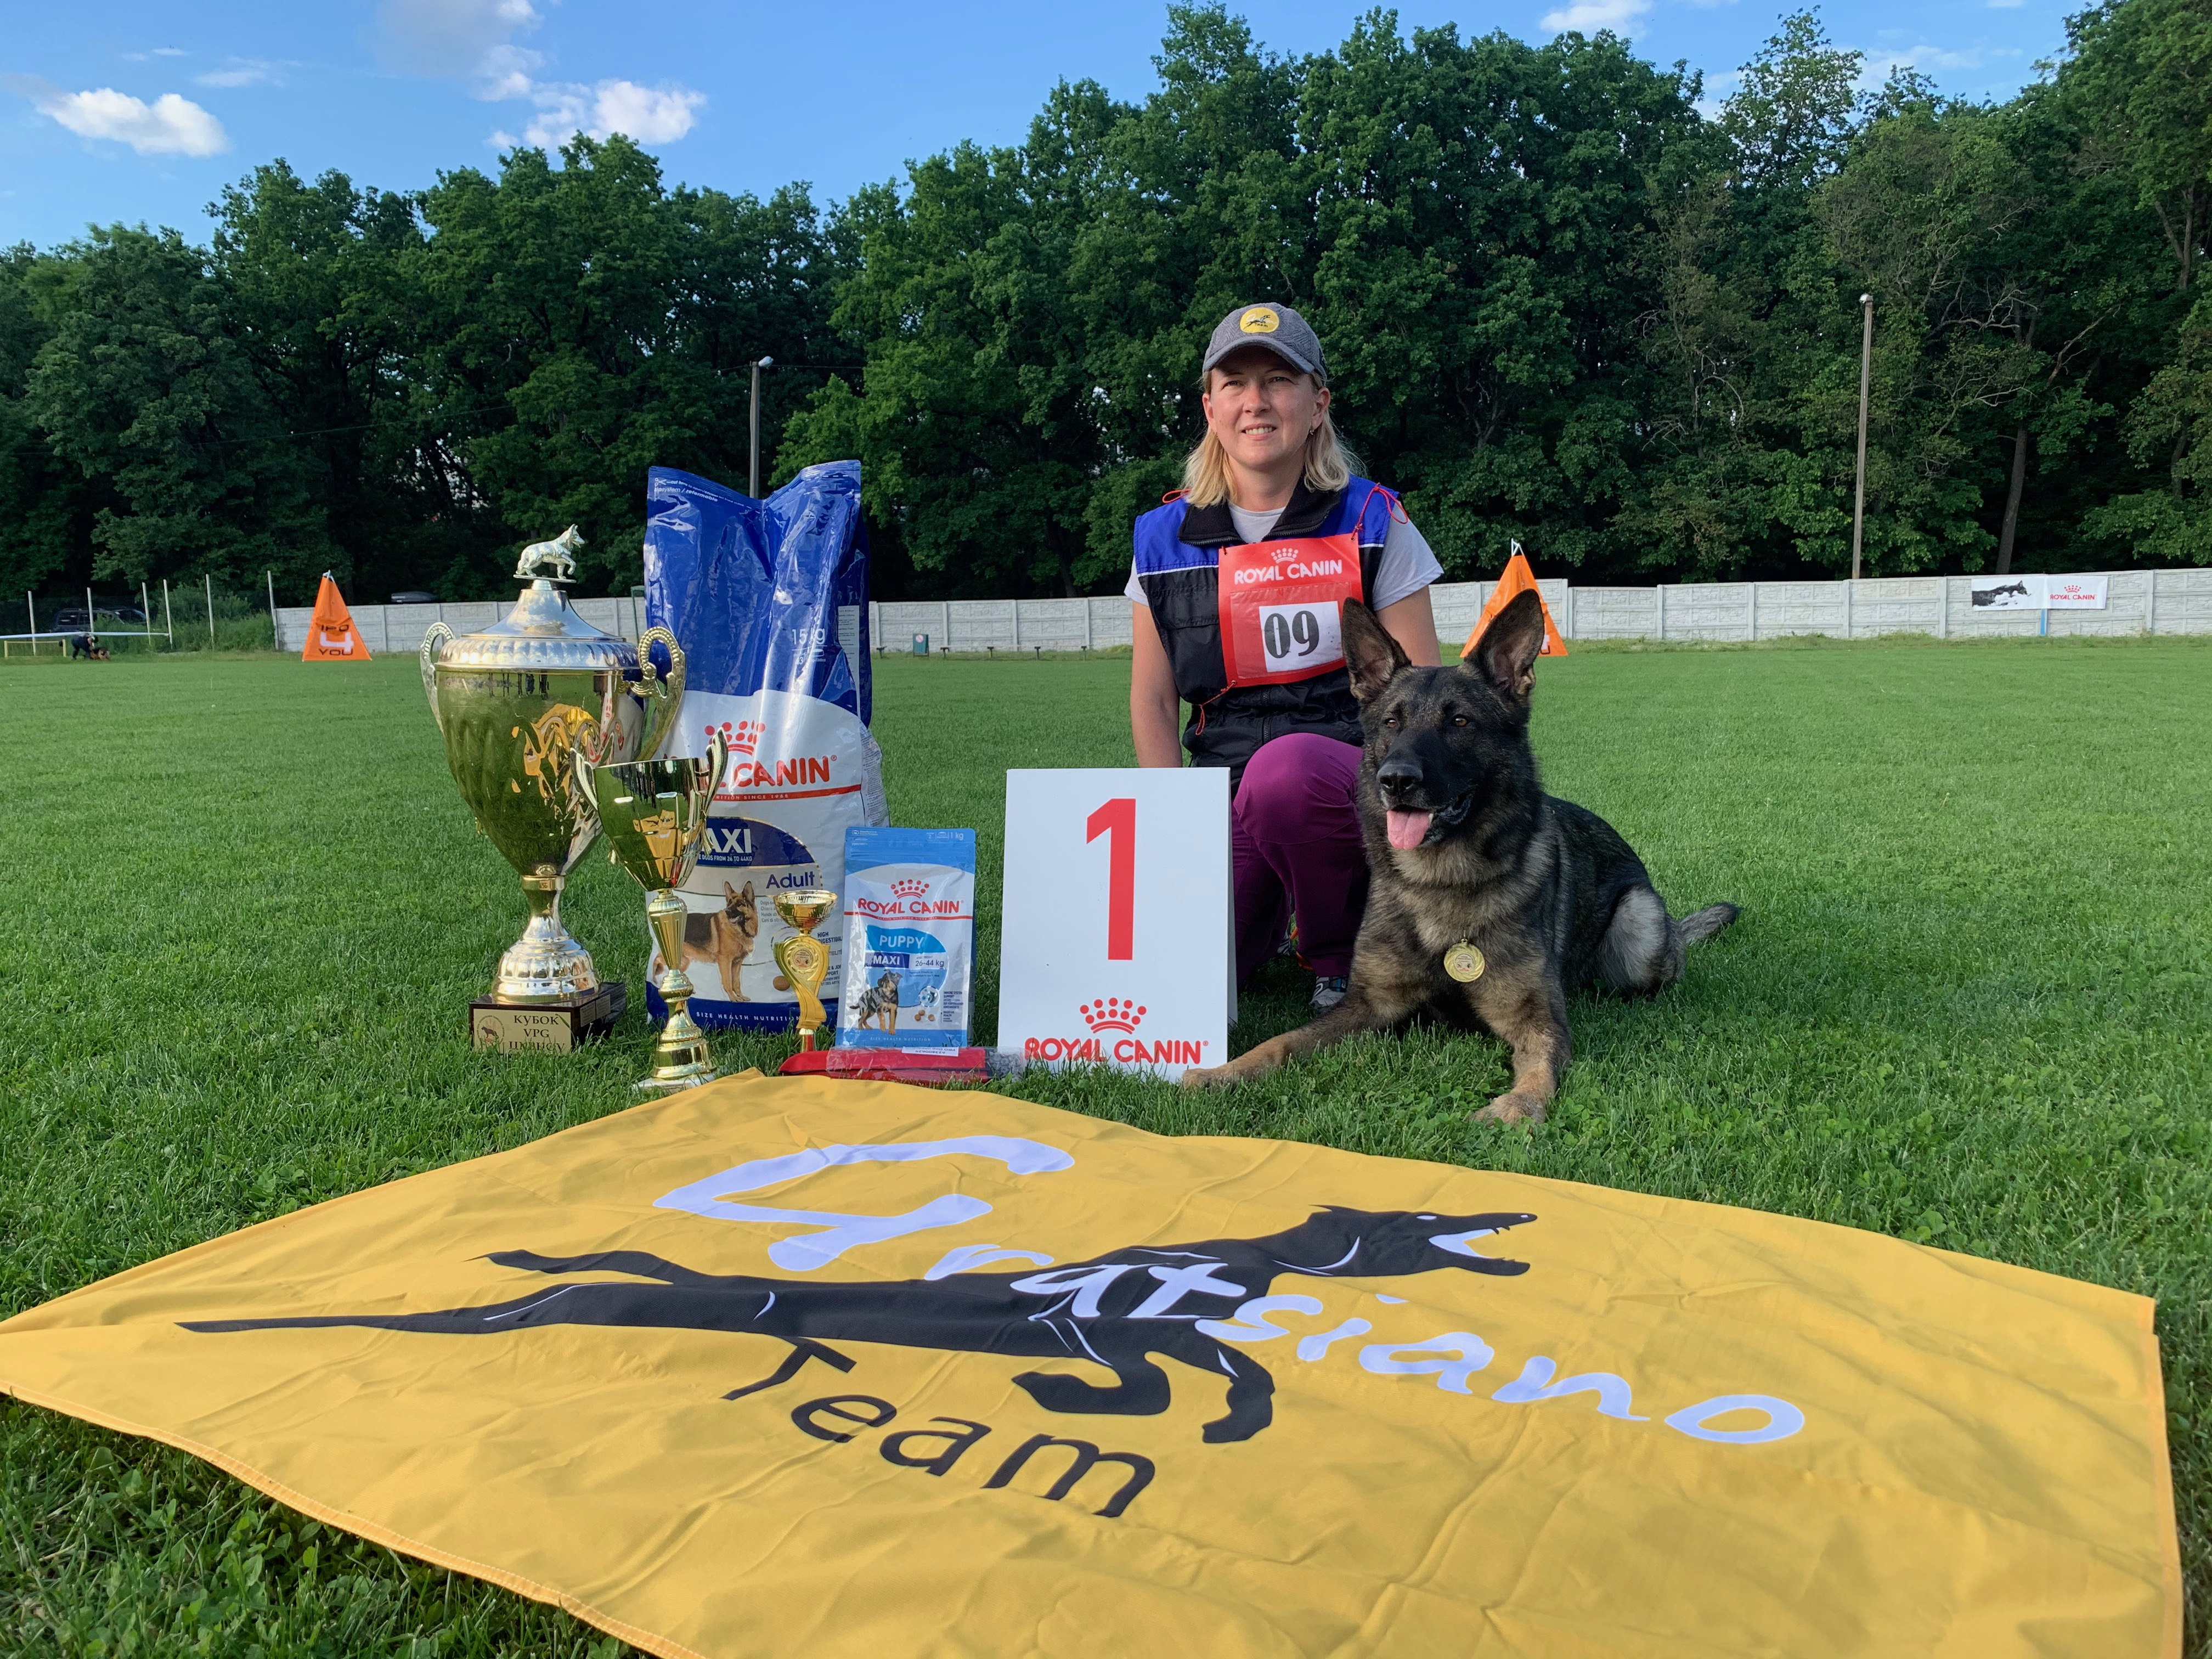 XXI Universal Championship on German Shepherd